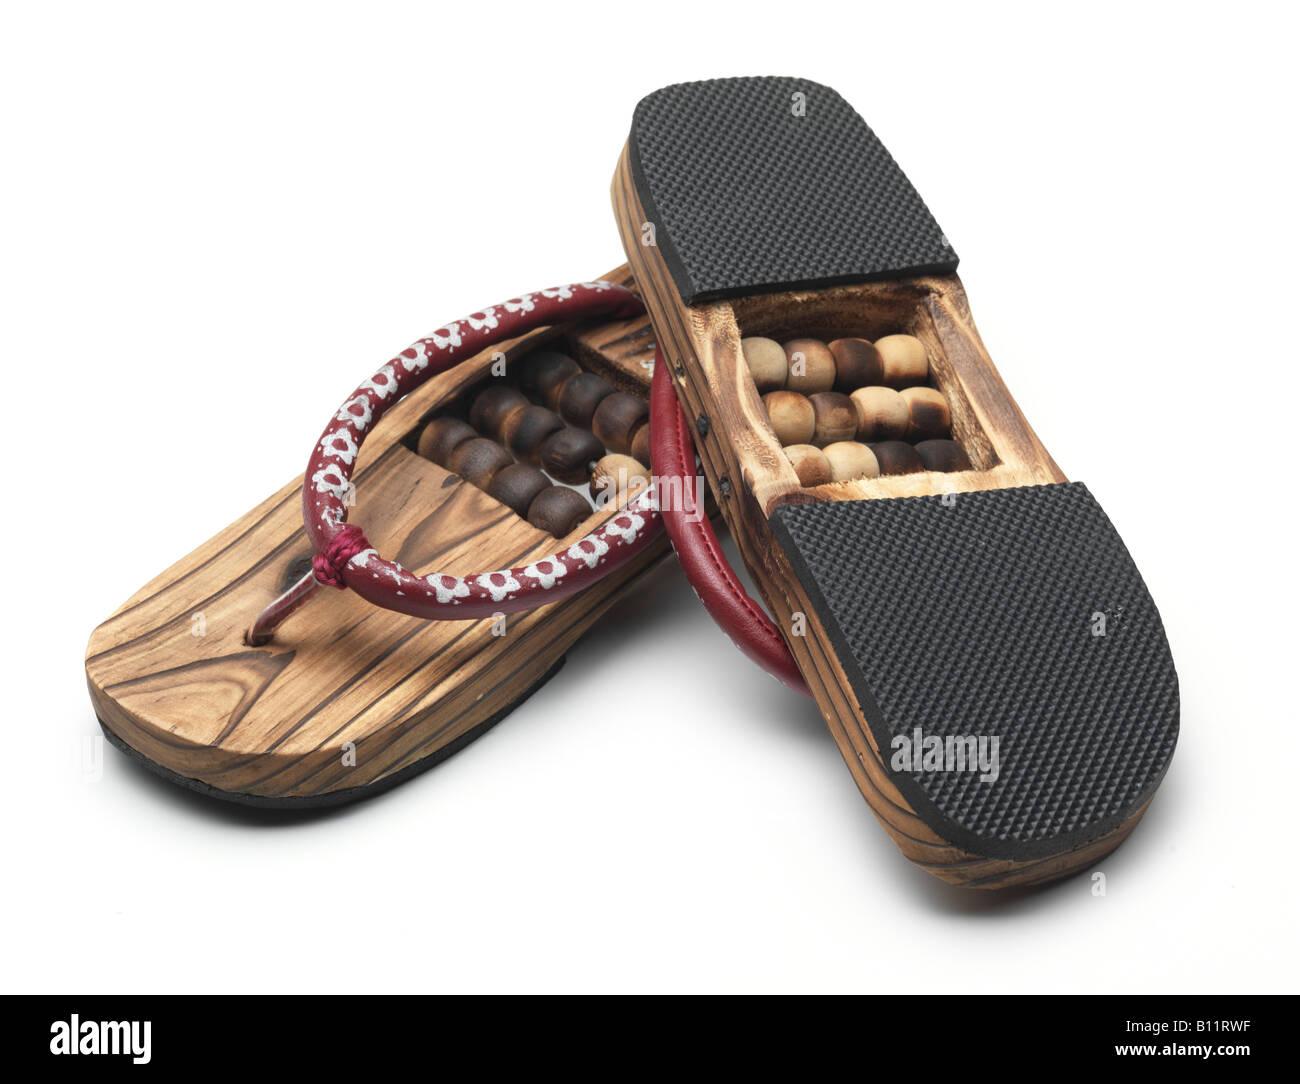 Wood Slipper Flip Flops Therapeutic Feet Massage Sole Outsole Gum